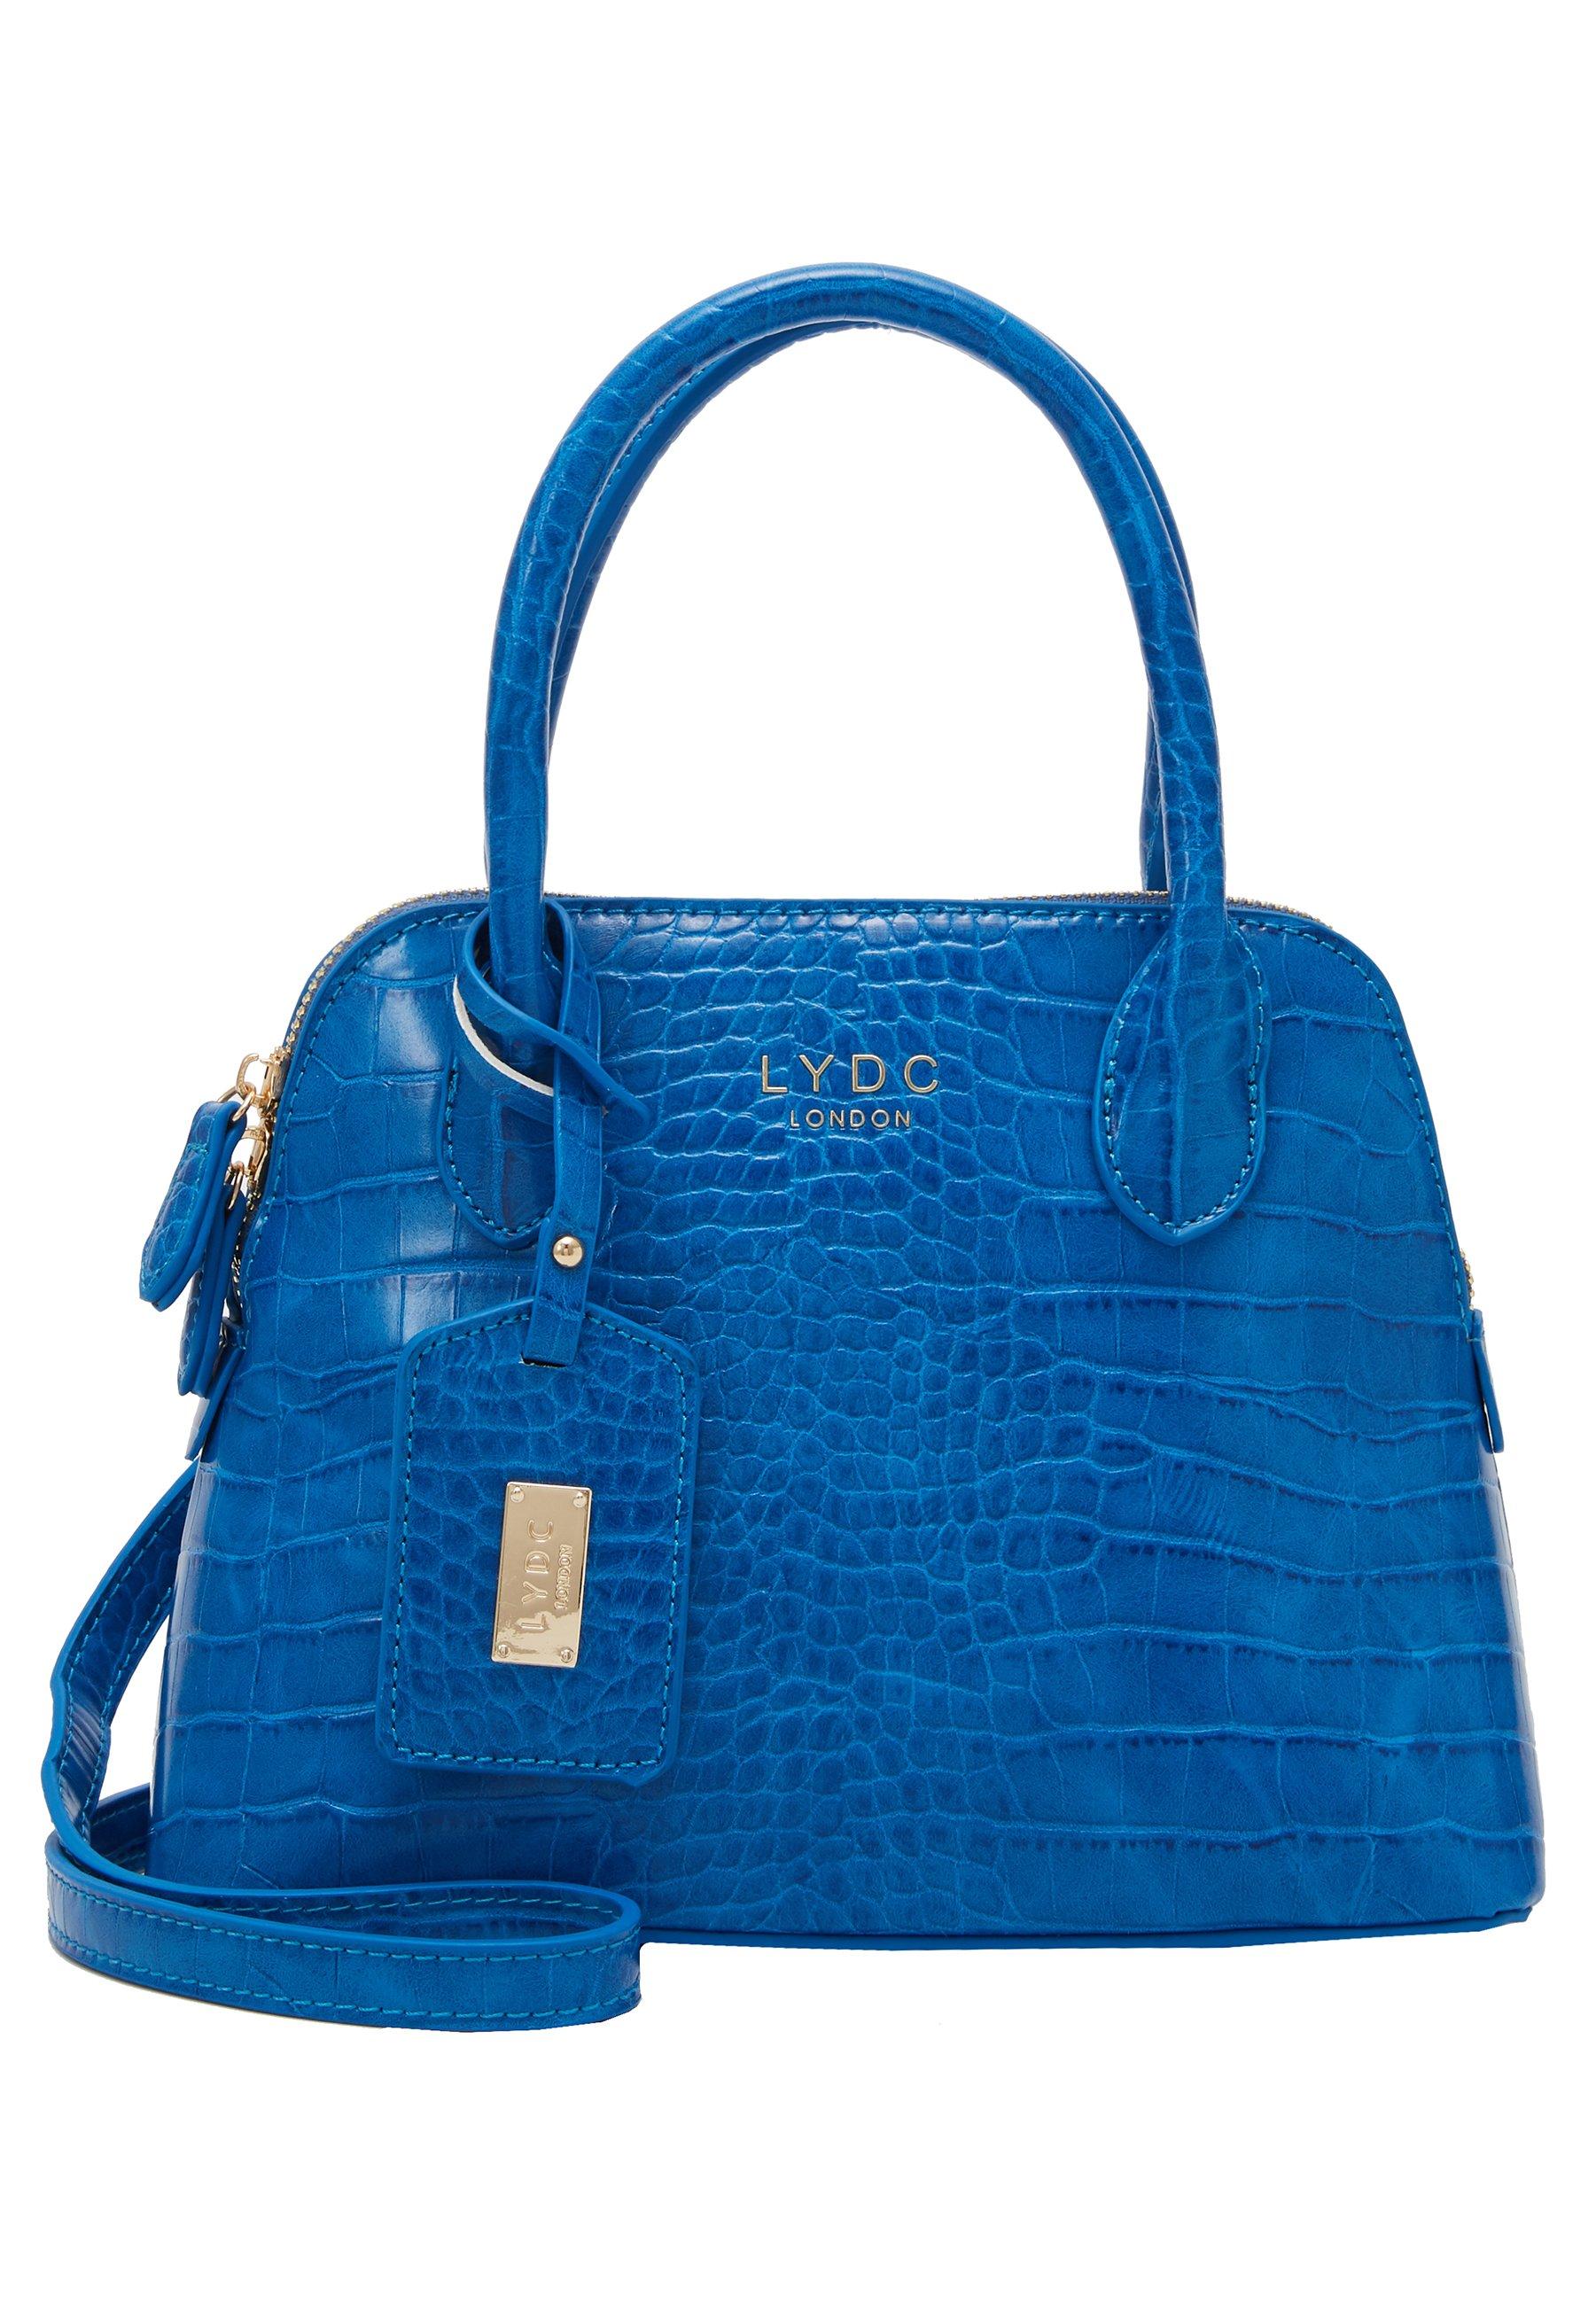 Lydc London Handbag - Blue